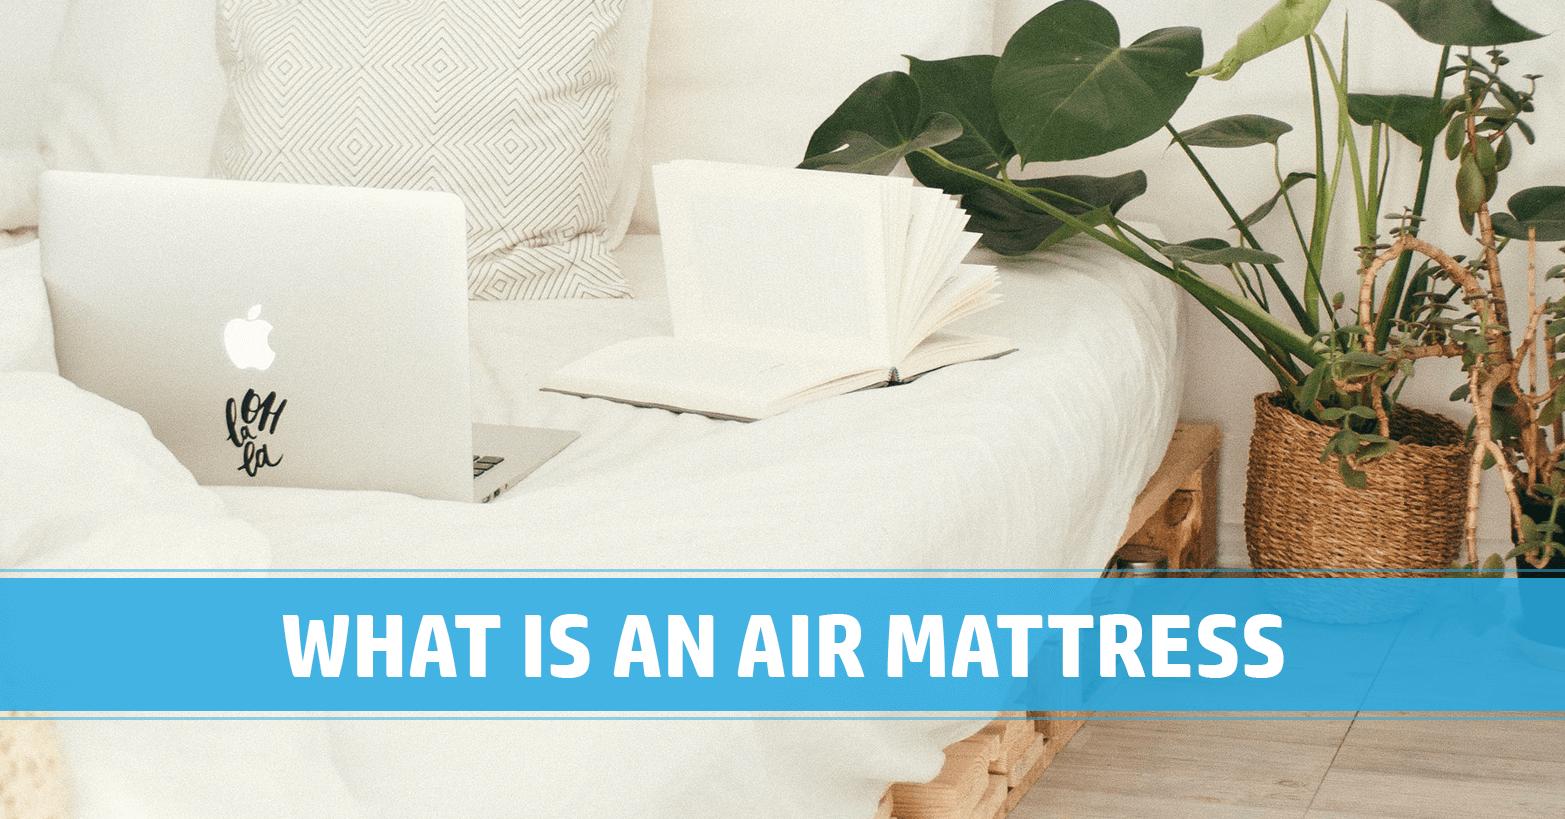 What is an Air Mattress?